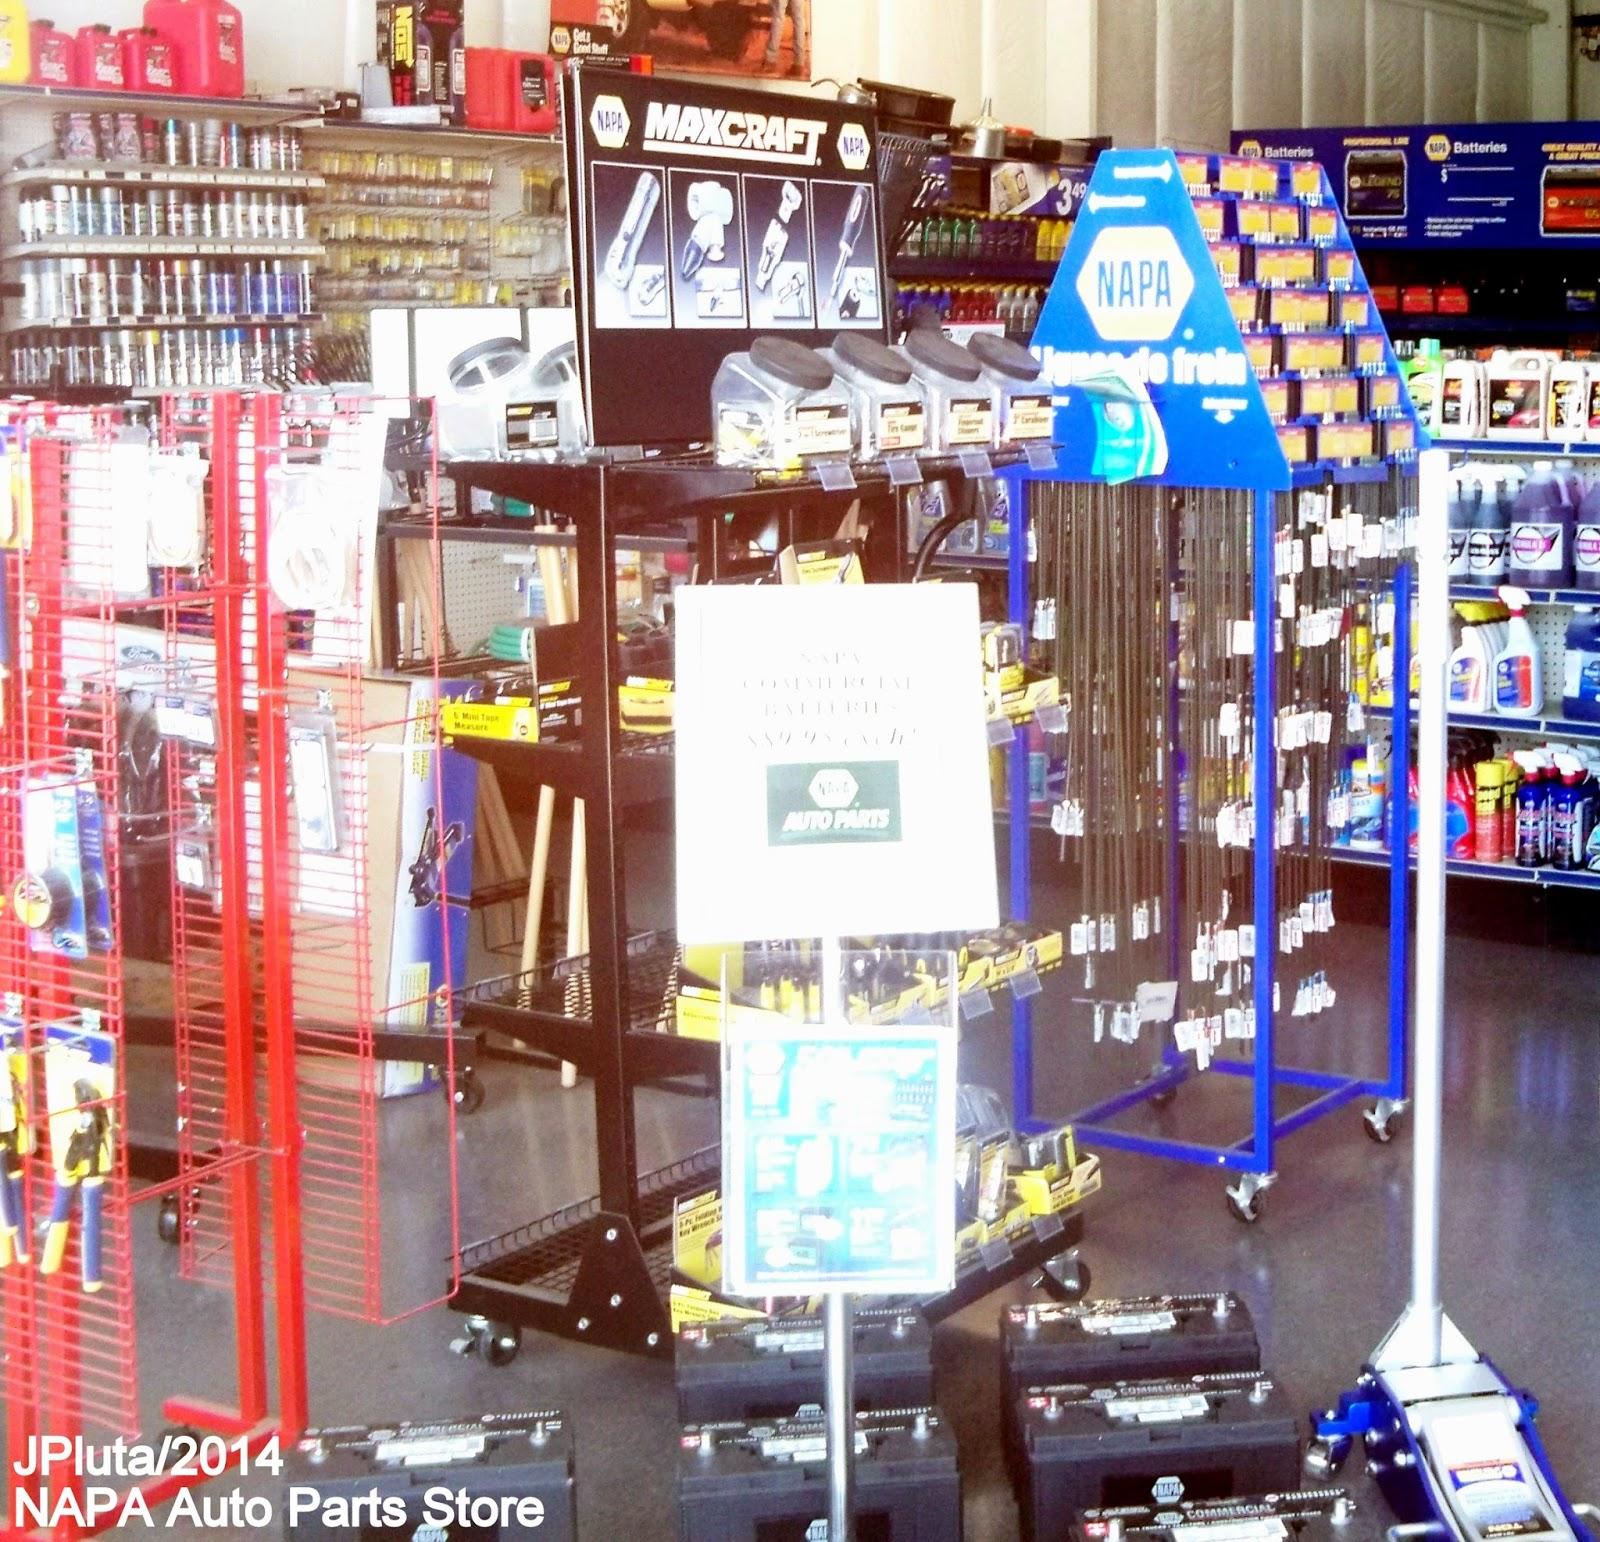 Parts Supply Store: SALT LAKE CITY UTAH Restaurant Attorney Bank Dr.Hospital